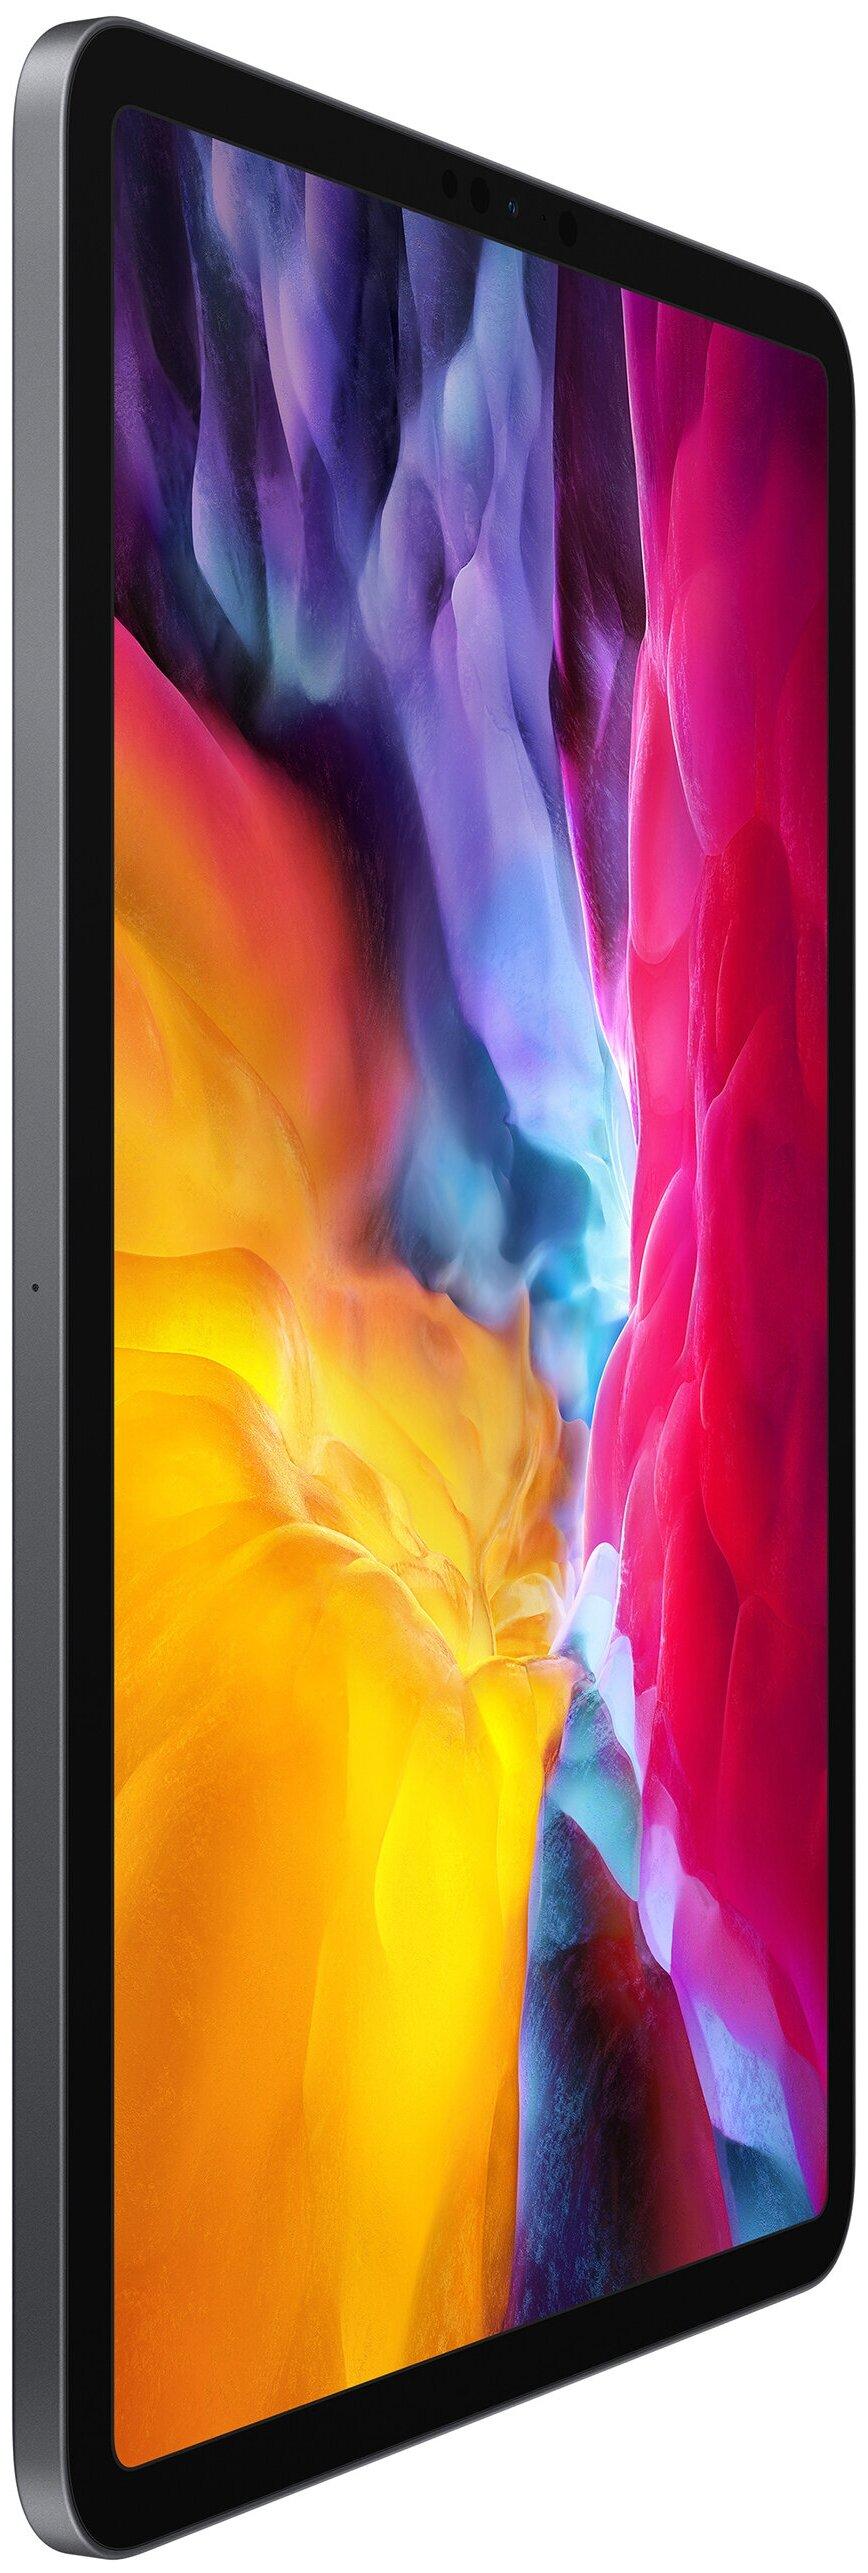 Apple iPad Pro 11 (2020) 256Gb Wi-Fi - камеры: основная 12МП, 10МП, фронтальная 7МП